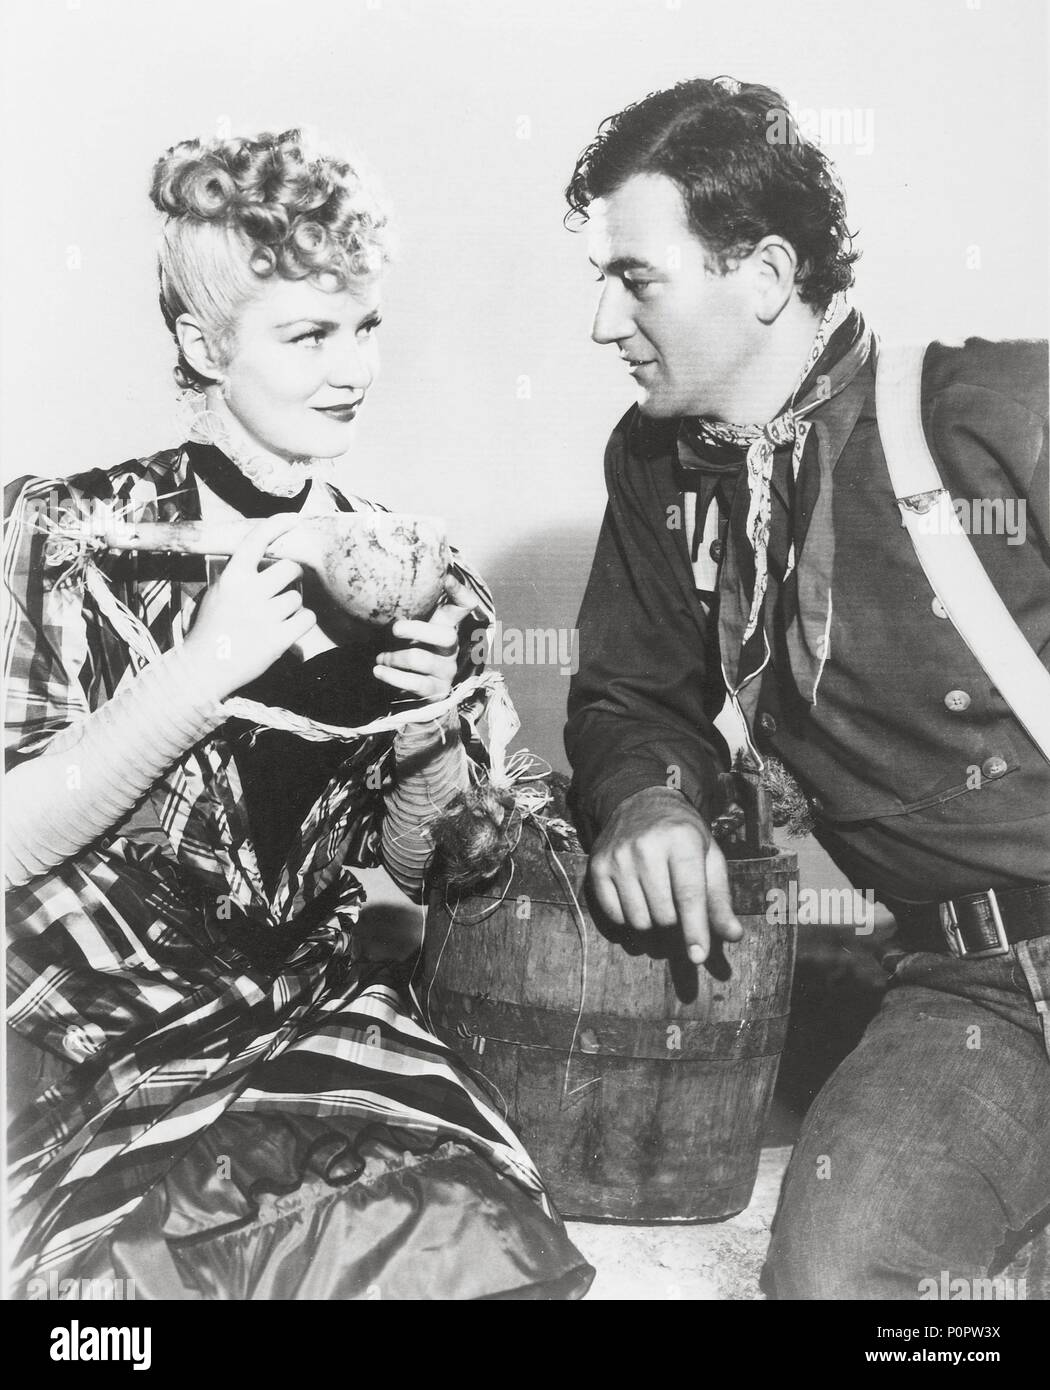 Original Film Title: STAGECOACH.  English Title: STAGECOACH.  Film Director: JOHN FORD.  Year: 1939.  Stars: JOHN WAYNE; CLAIRE TREVOR. Credit: UNITED ARTISTS / Album - Stock Image